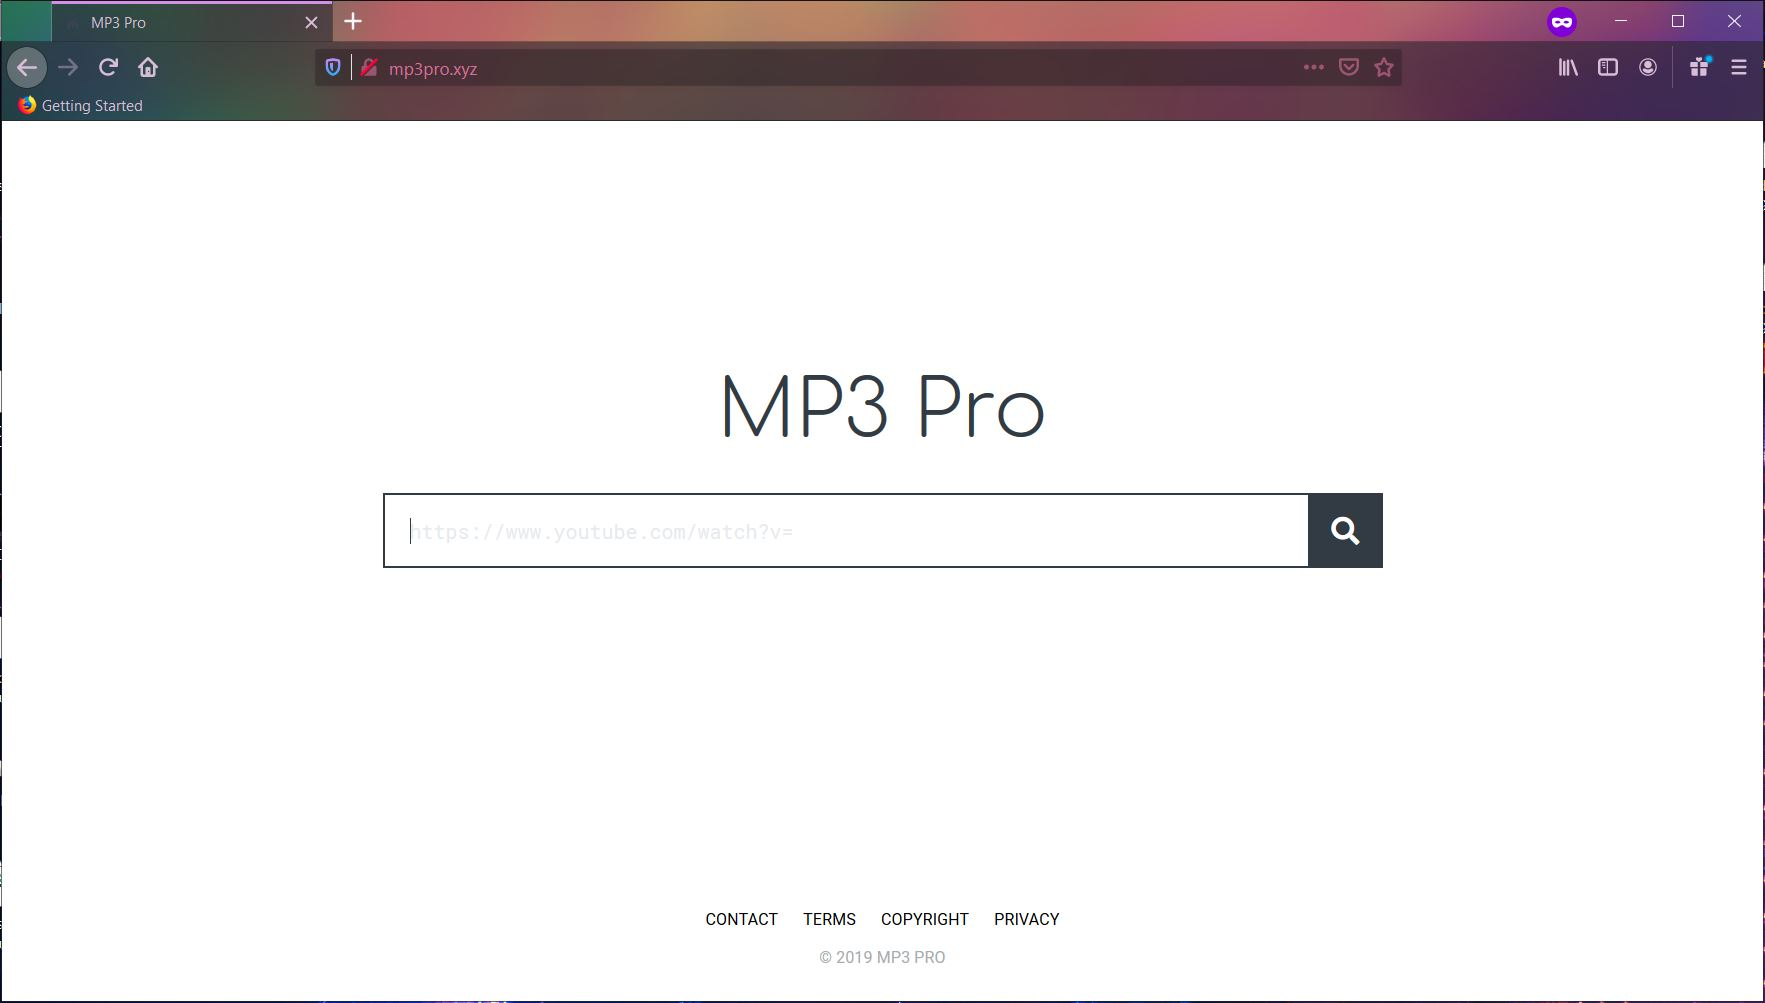 retirer le moteur de recherche canular mp3pro.xyz sensorstechforum